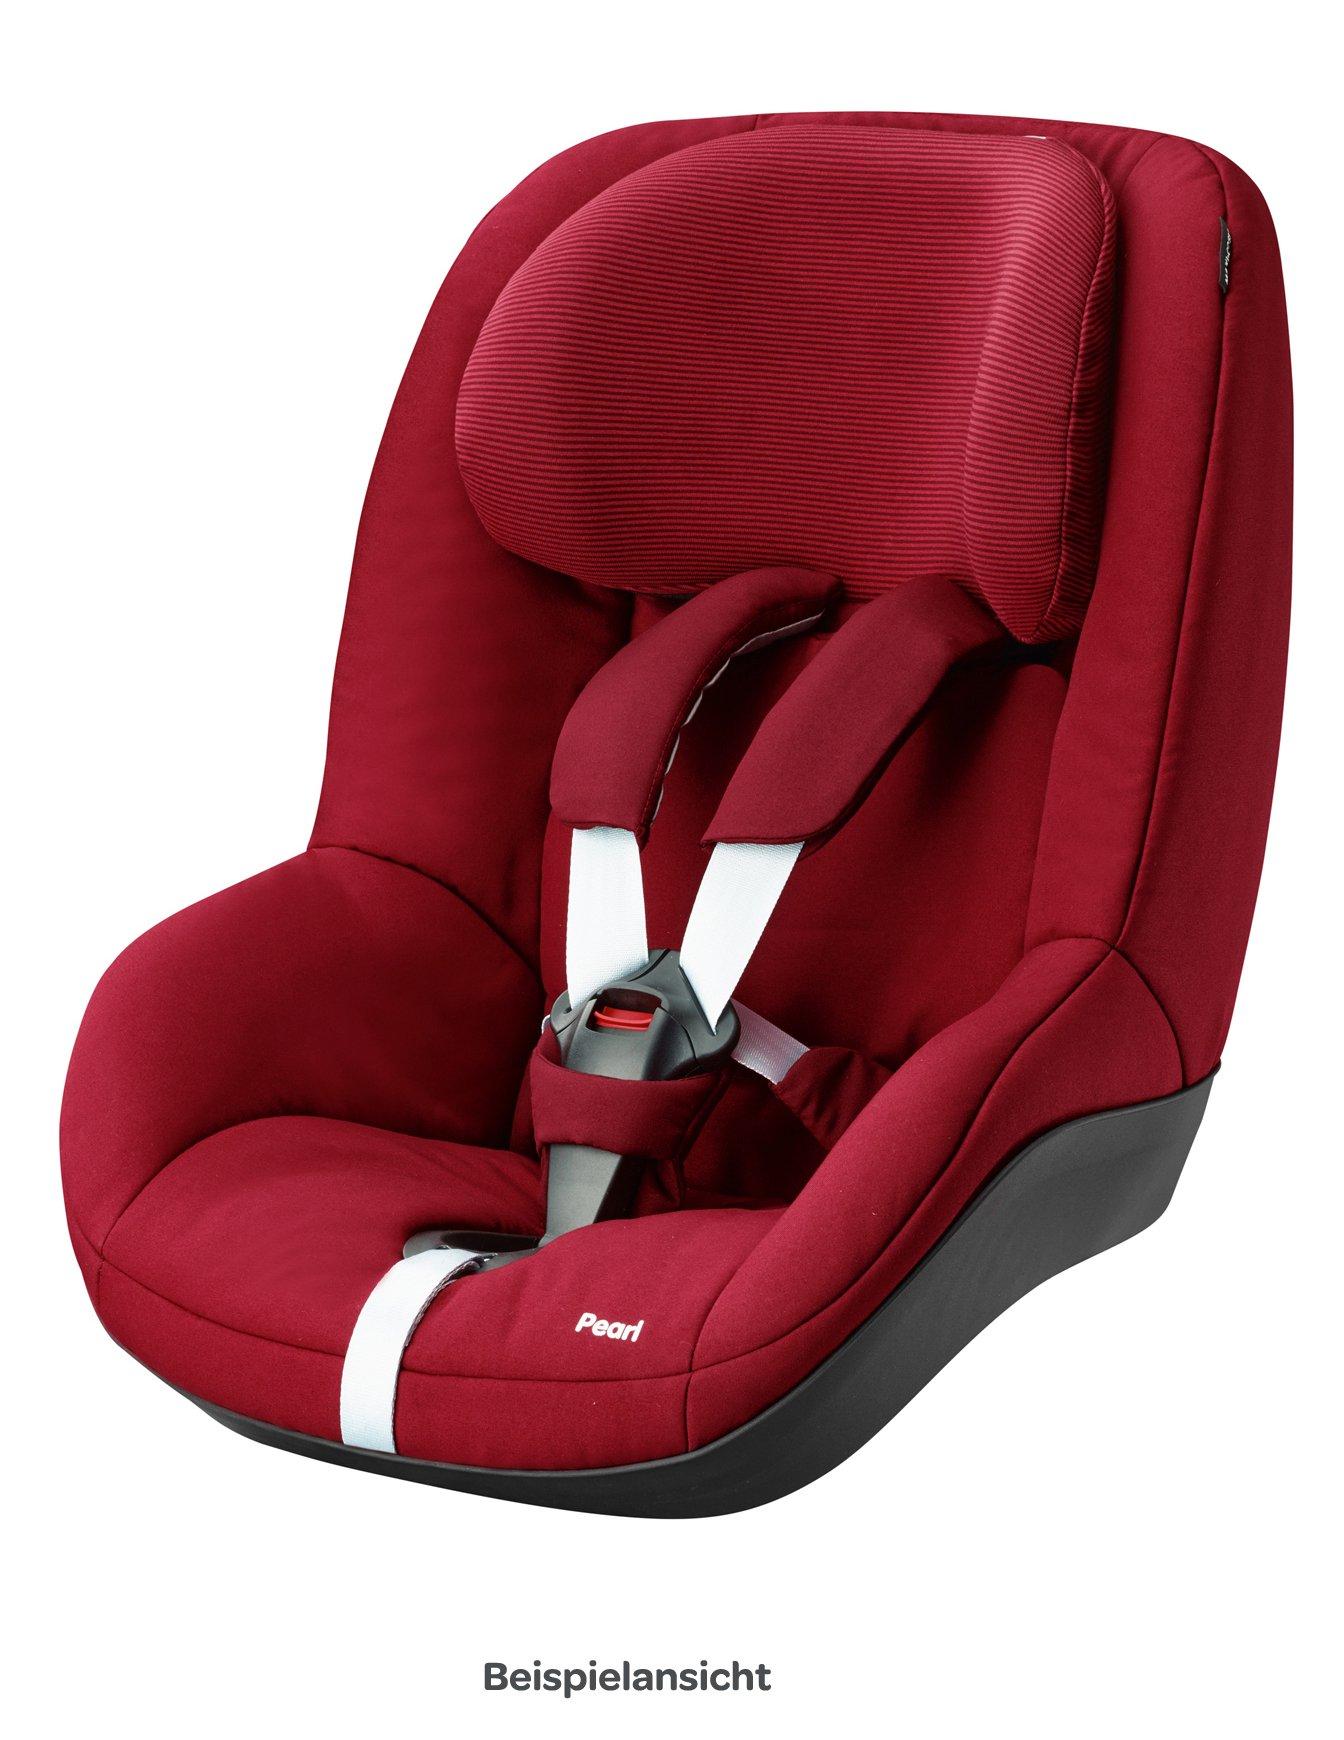 Maxi-Cosi 63409641Pearl Children's Seat, Group 1, 9-18kg Maxi-Cosi  14